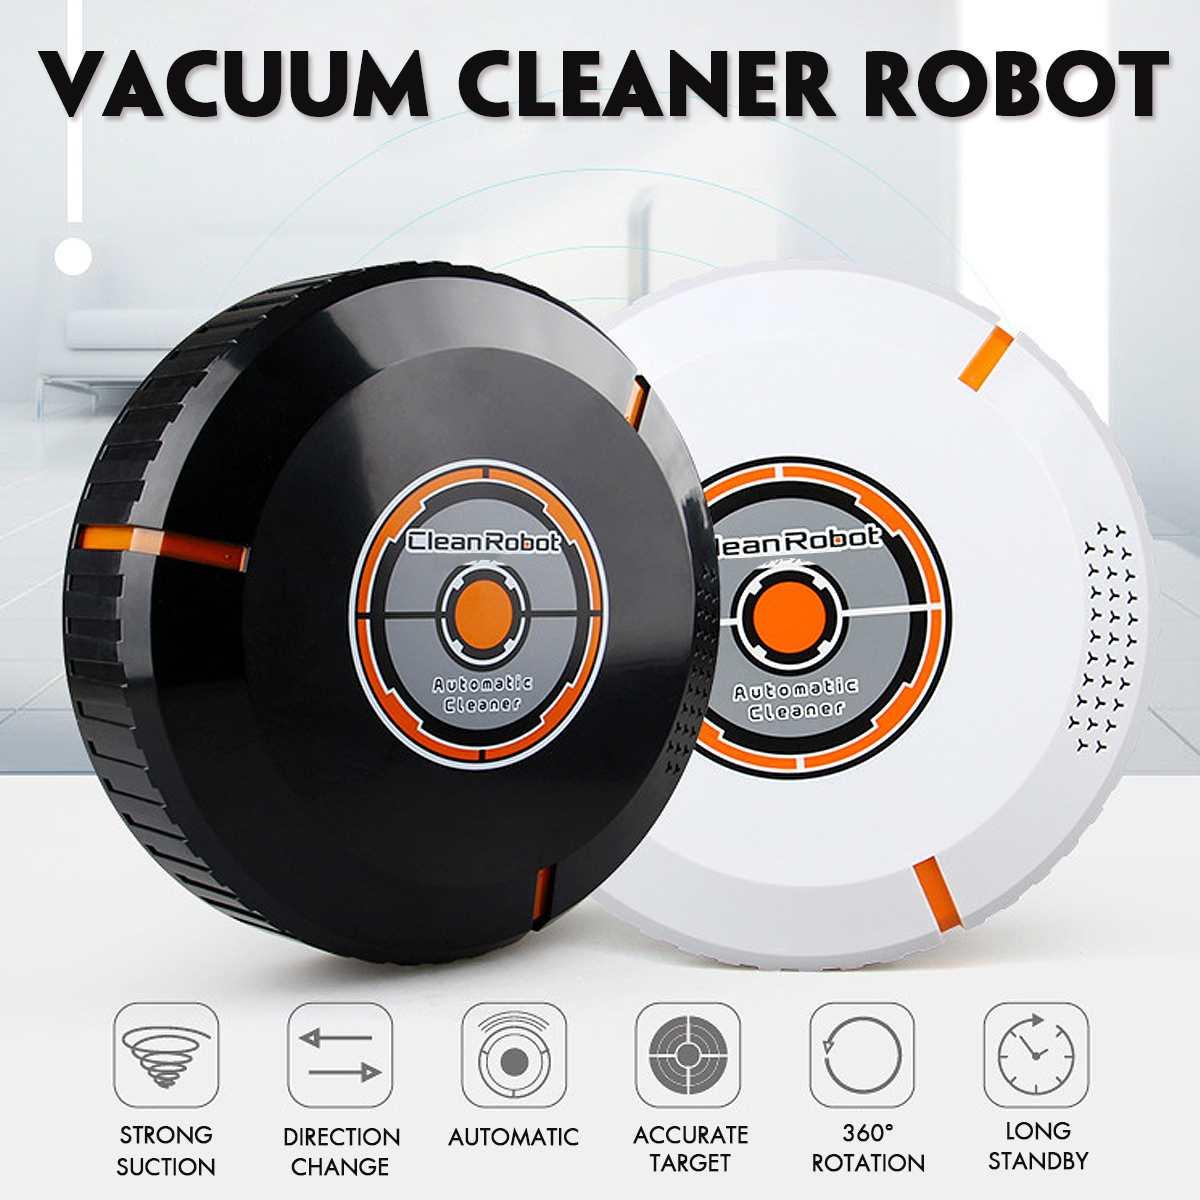 1 Piezas De Robot Barriendo Usb Recargable Vacío Limpiador Eléctrico Inteligente Inalámbrico Aspiradora Robot